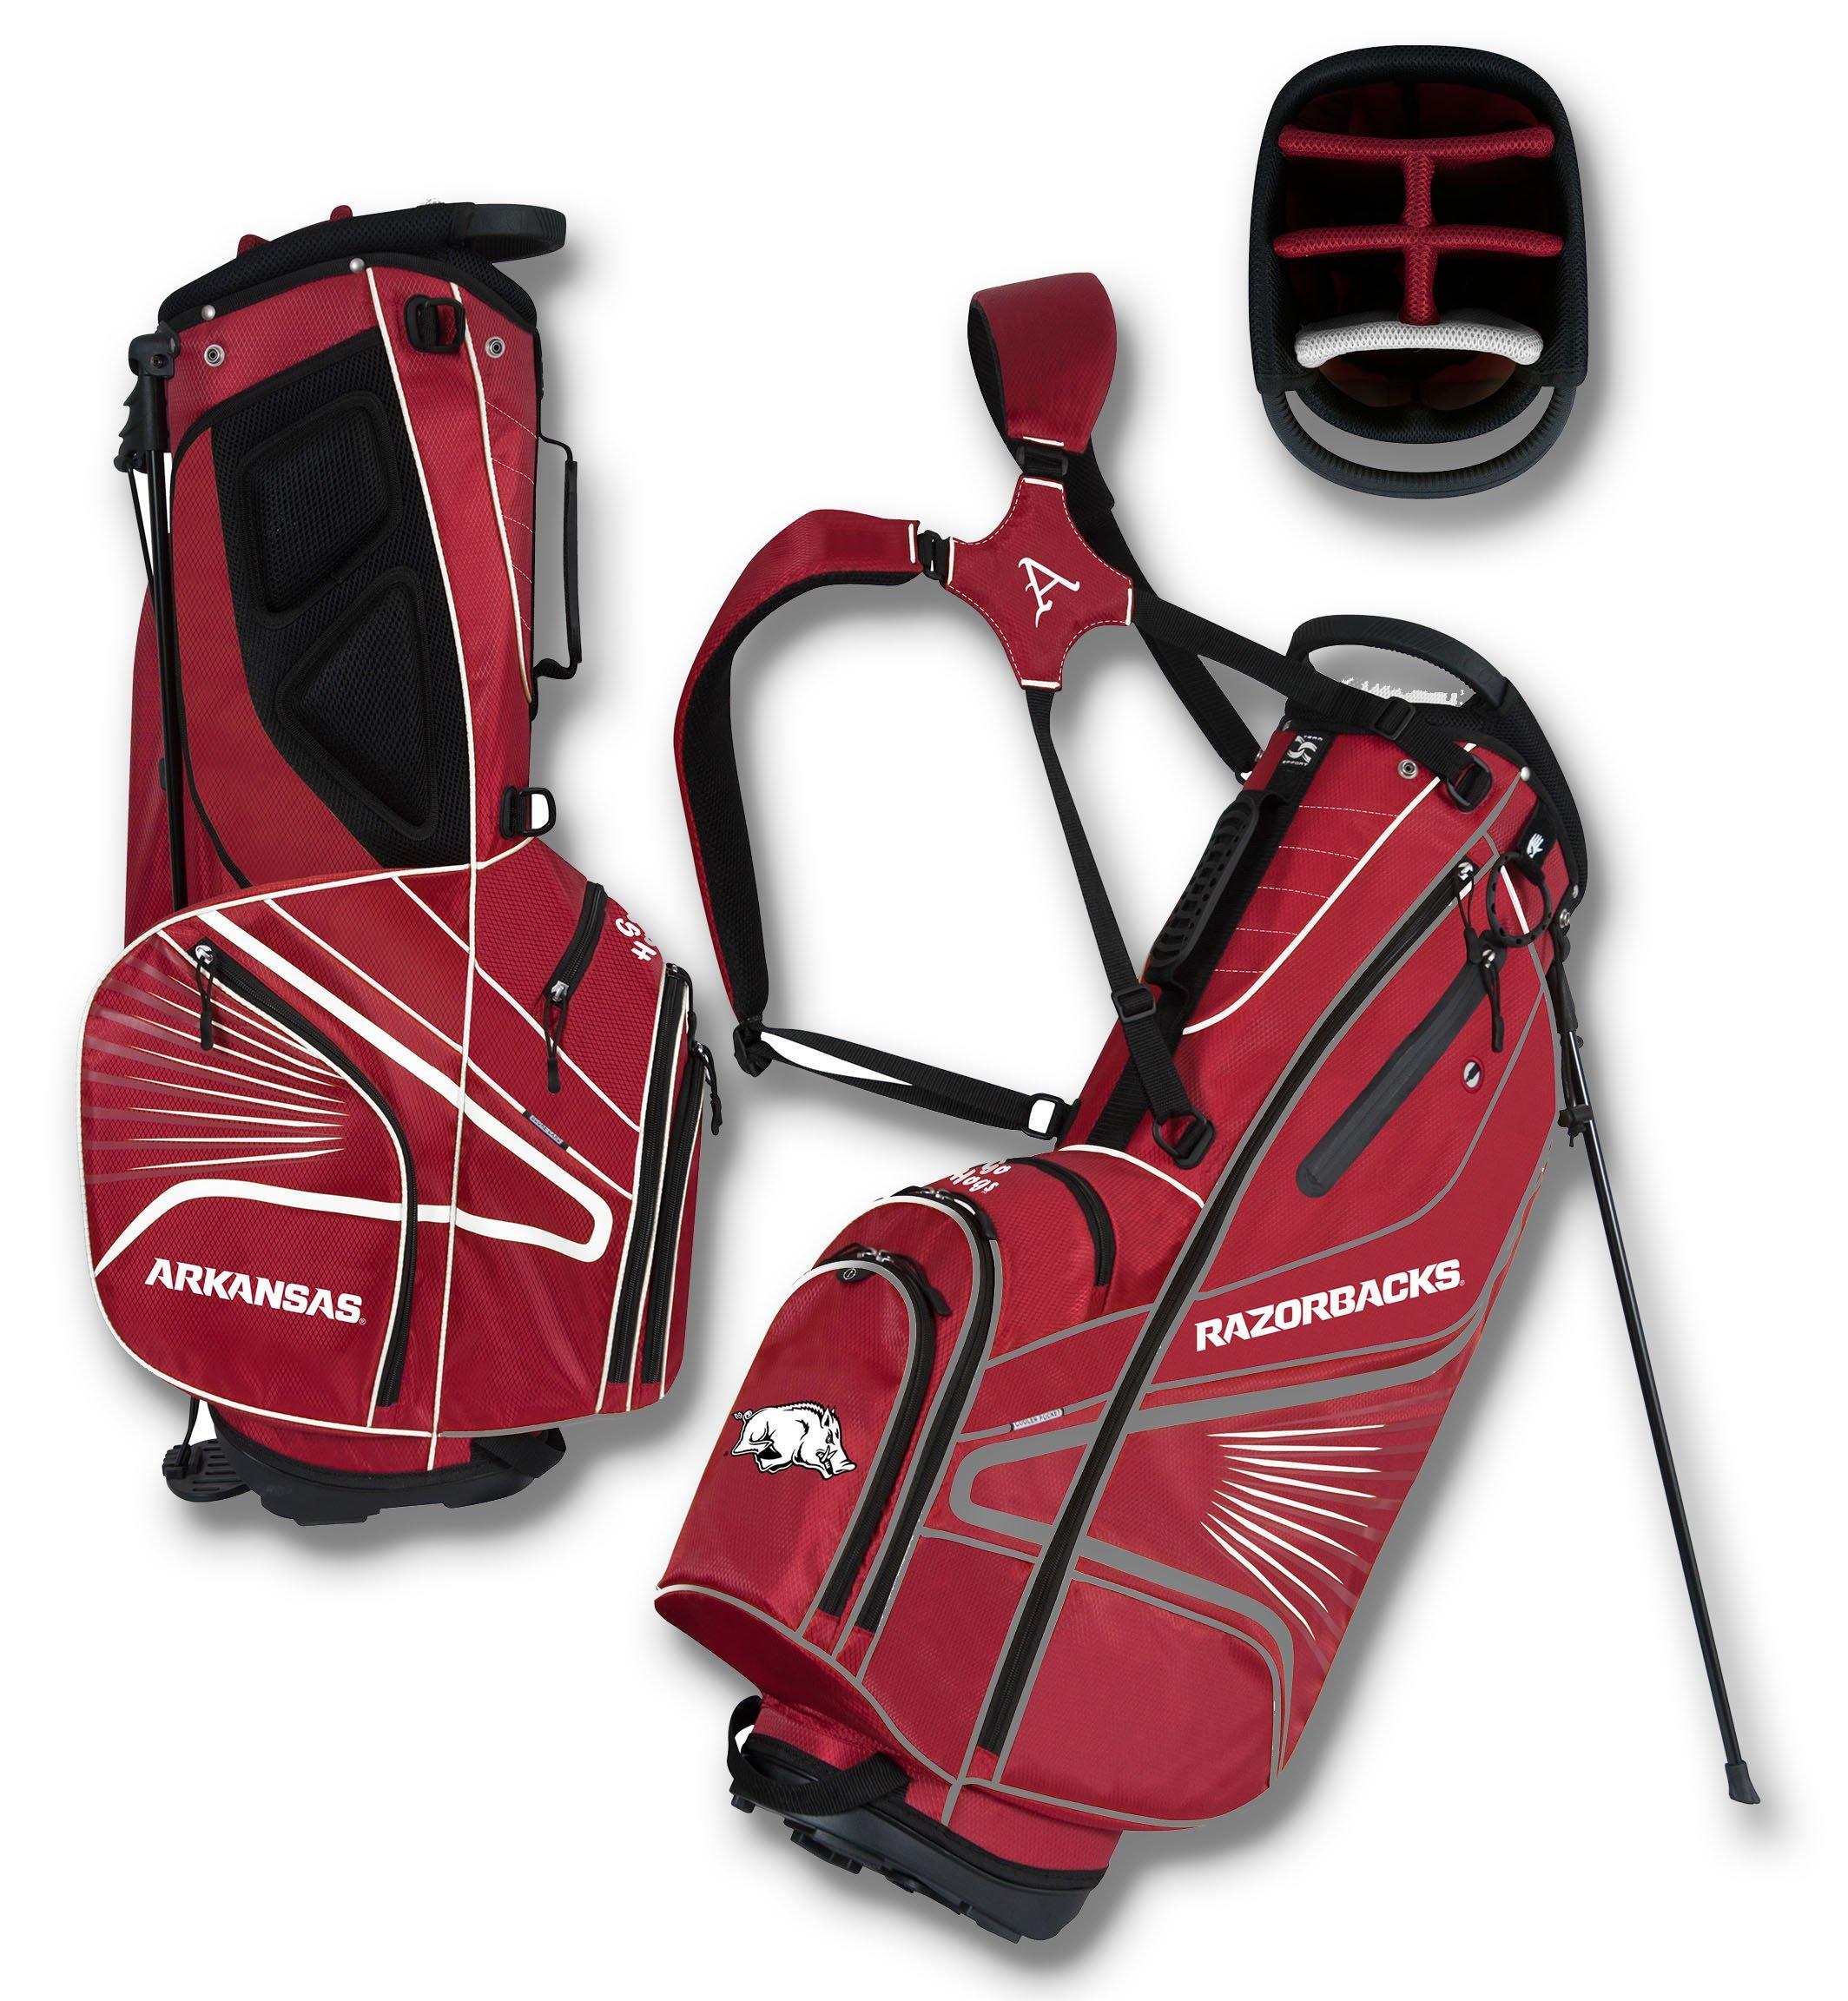 arkansas Razorbacks gridiron iii golf stand bag